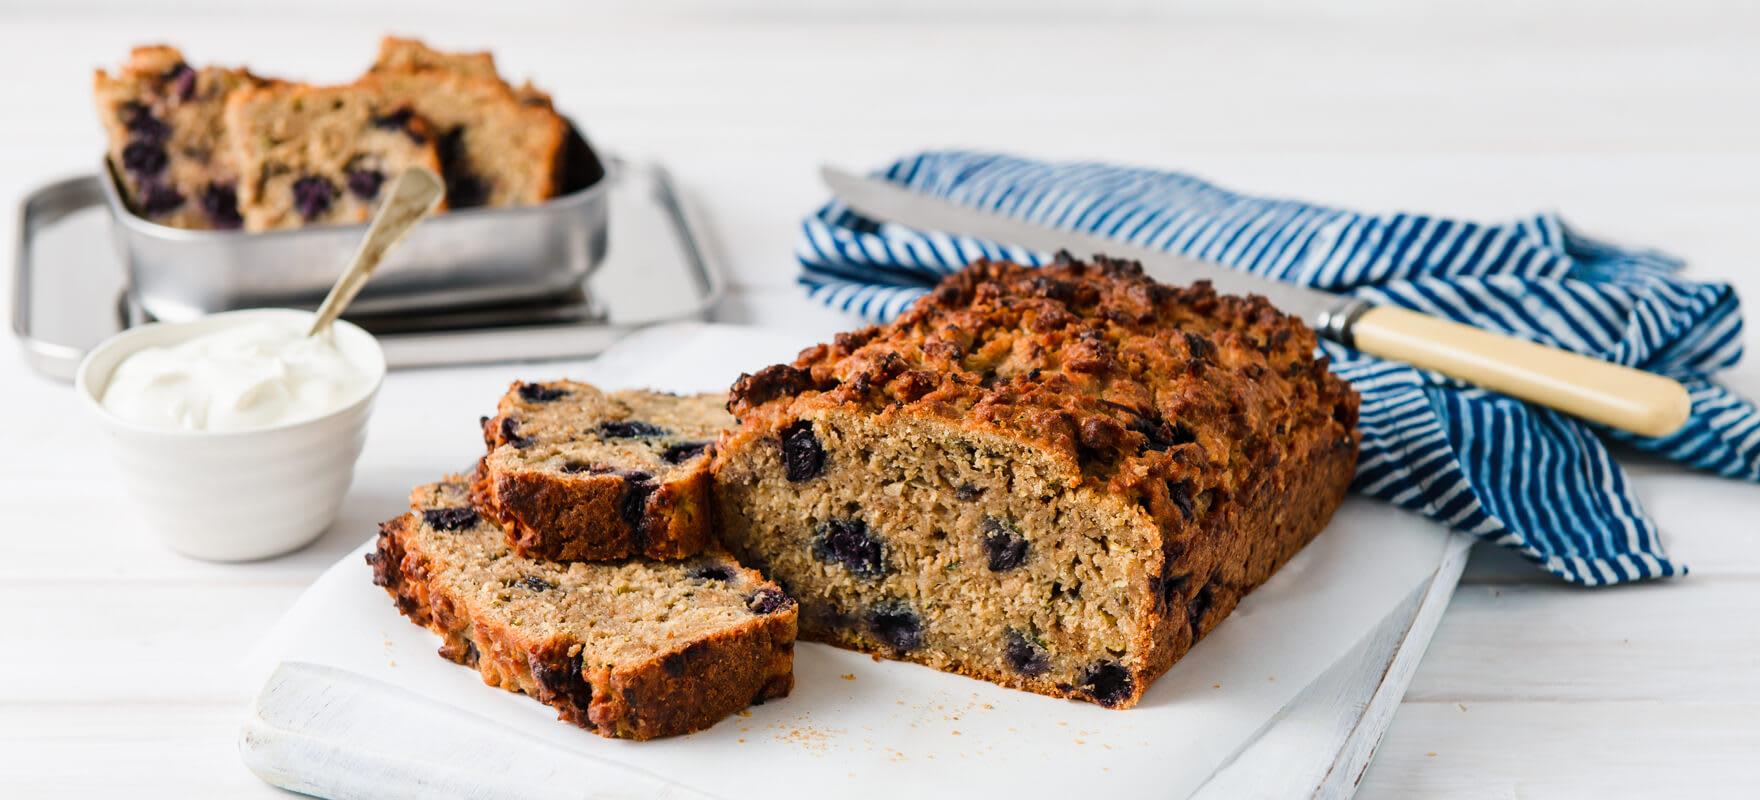 Blueberry & banana bread image 1